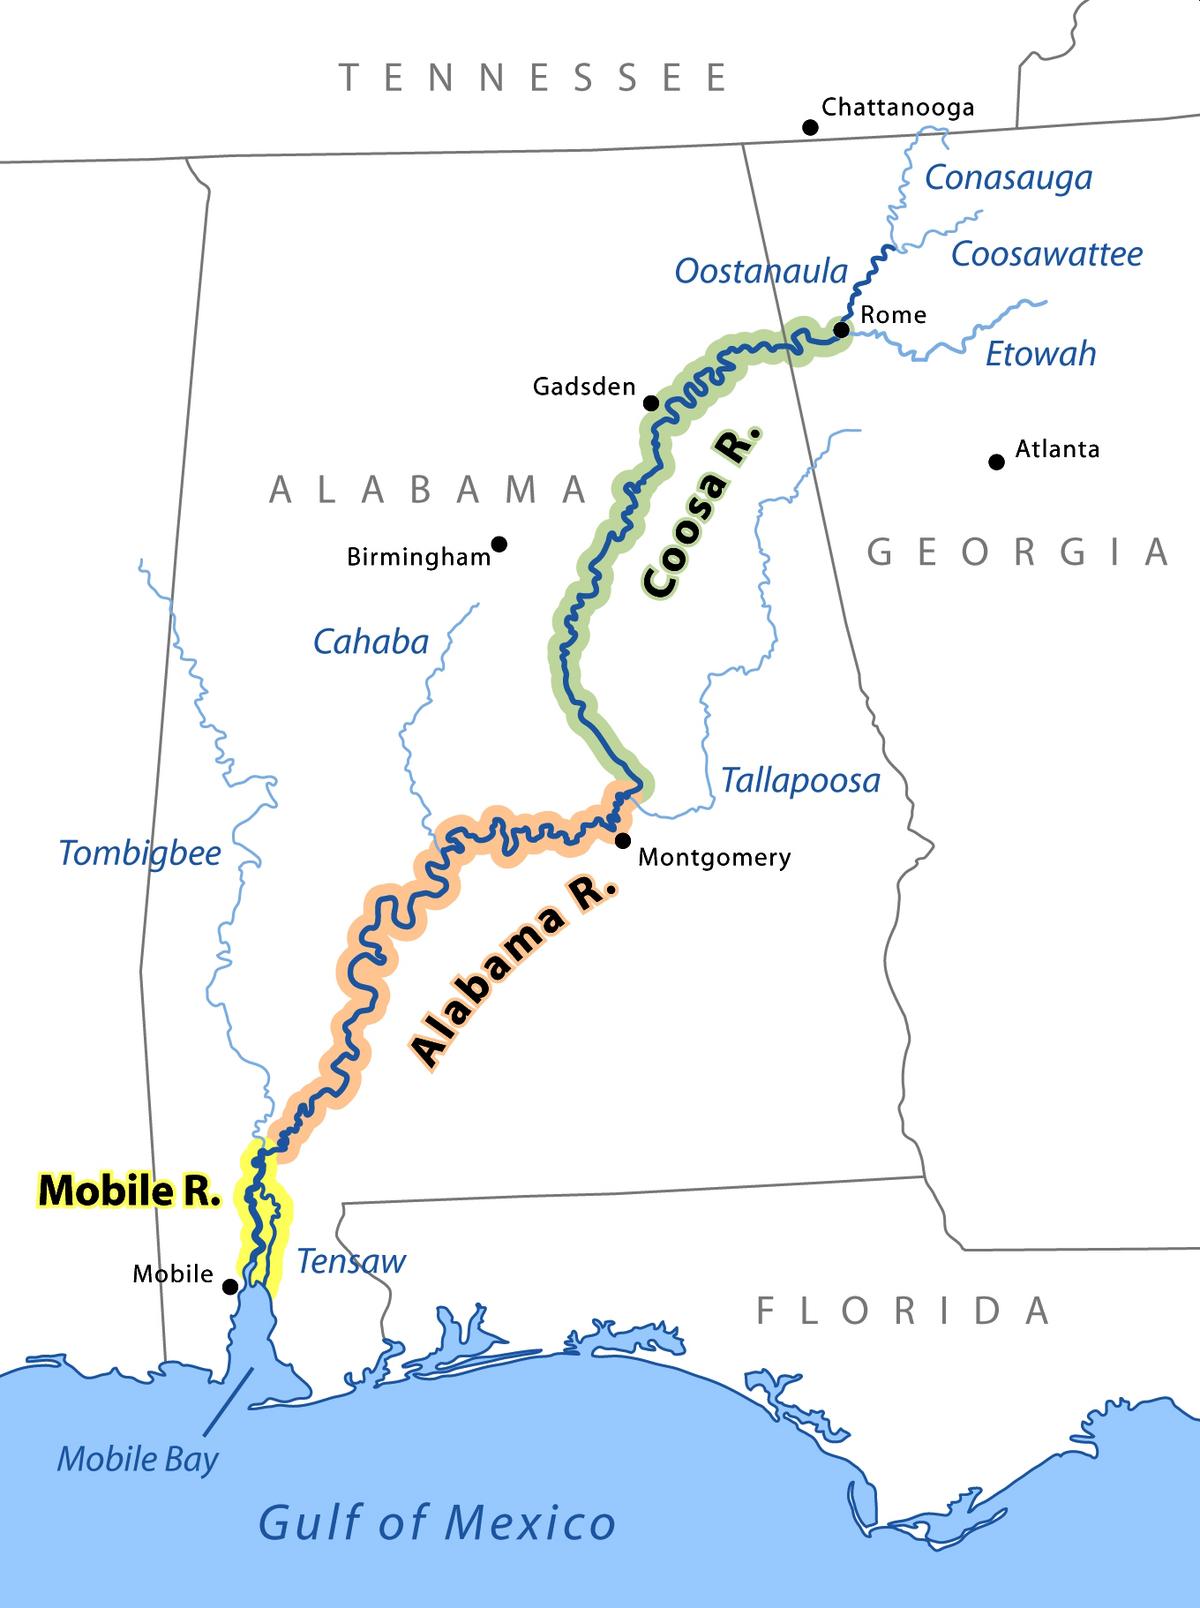 Mobile River Wikipedia - Alabama on a us map